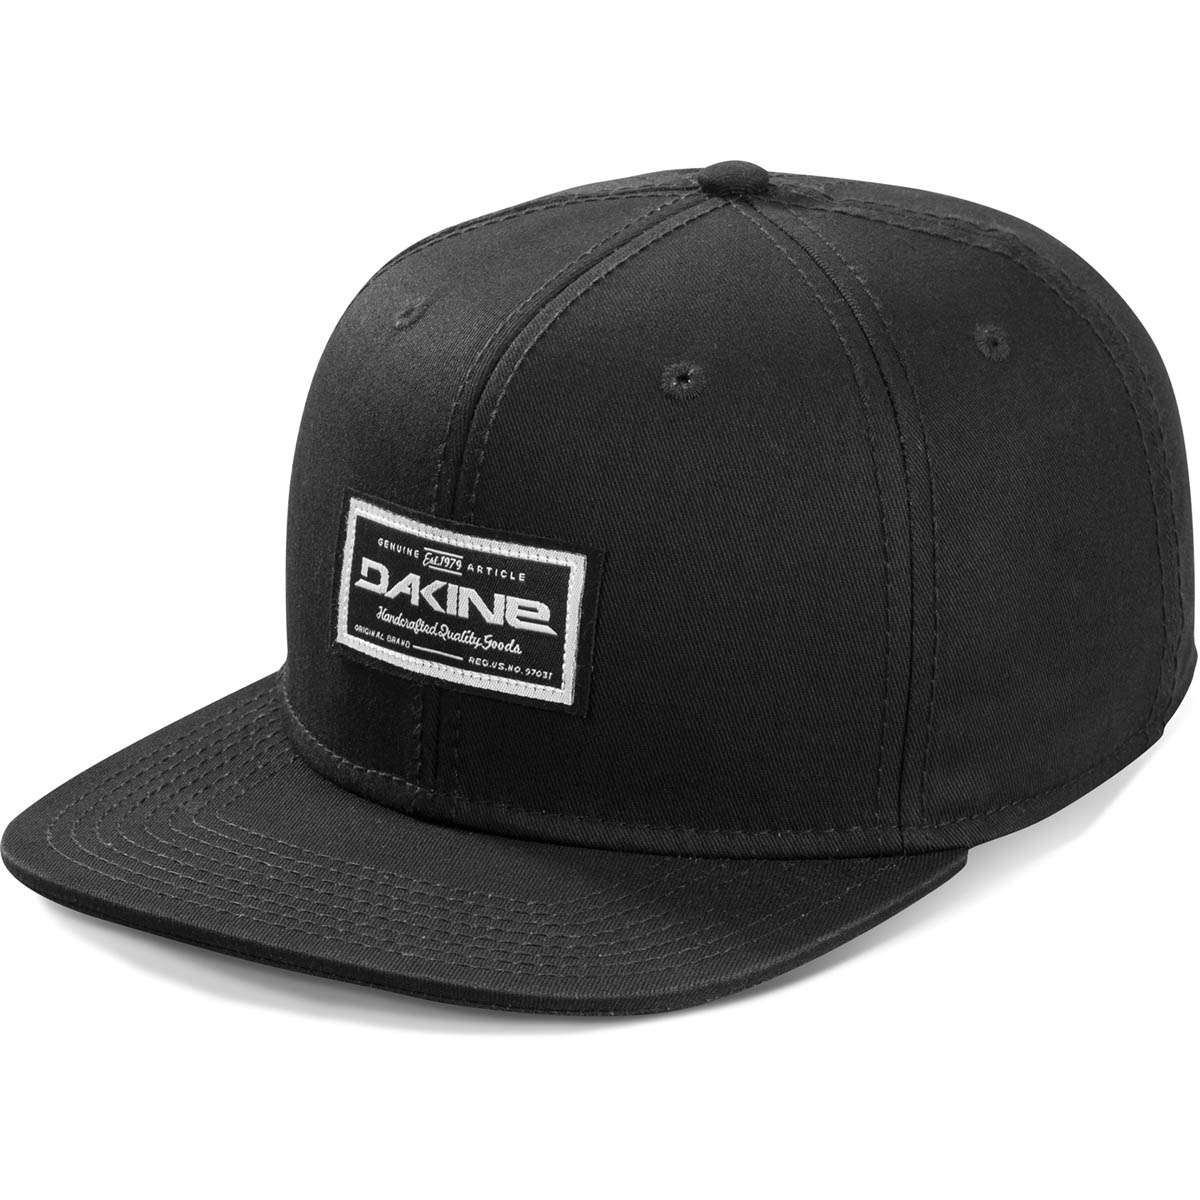 Dakine Quality Goods Baseball Cap Black  9eeab9e959d